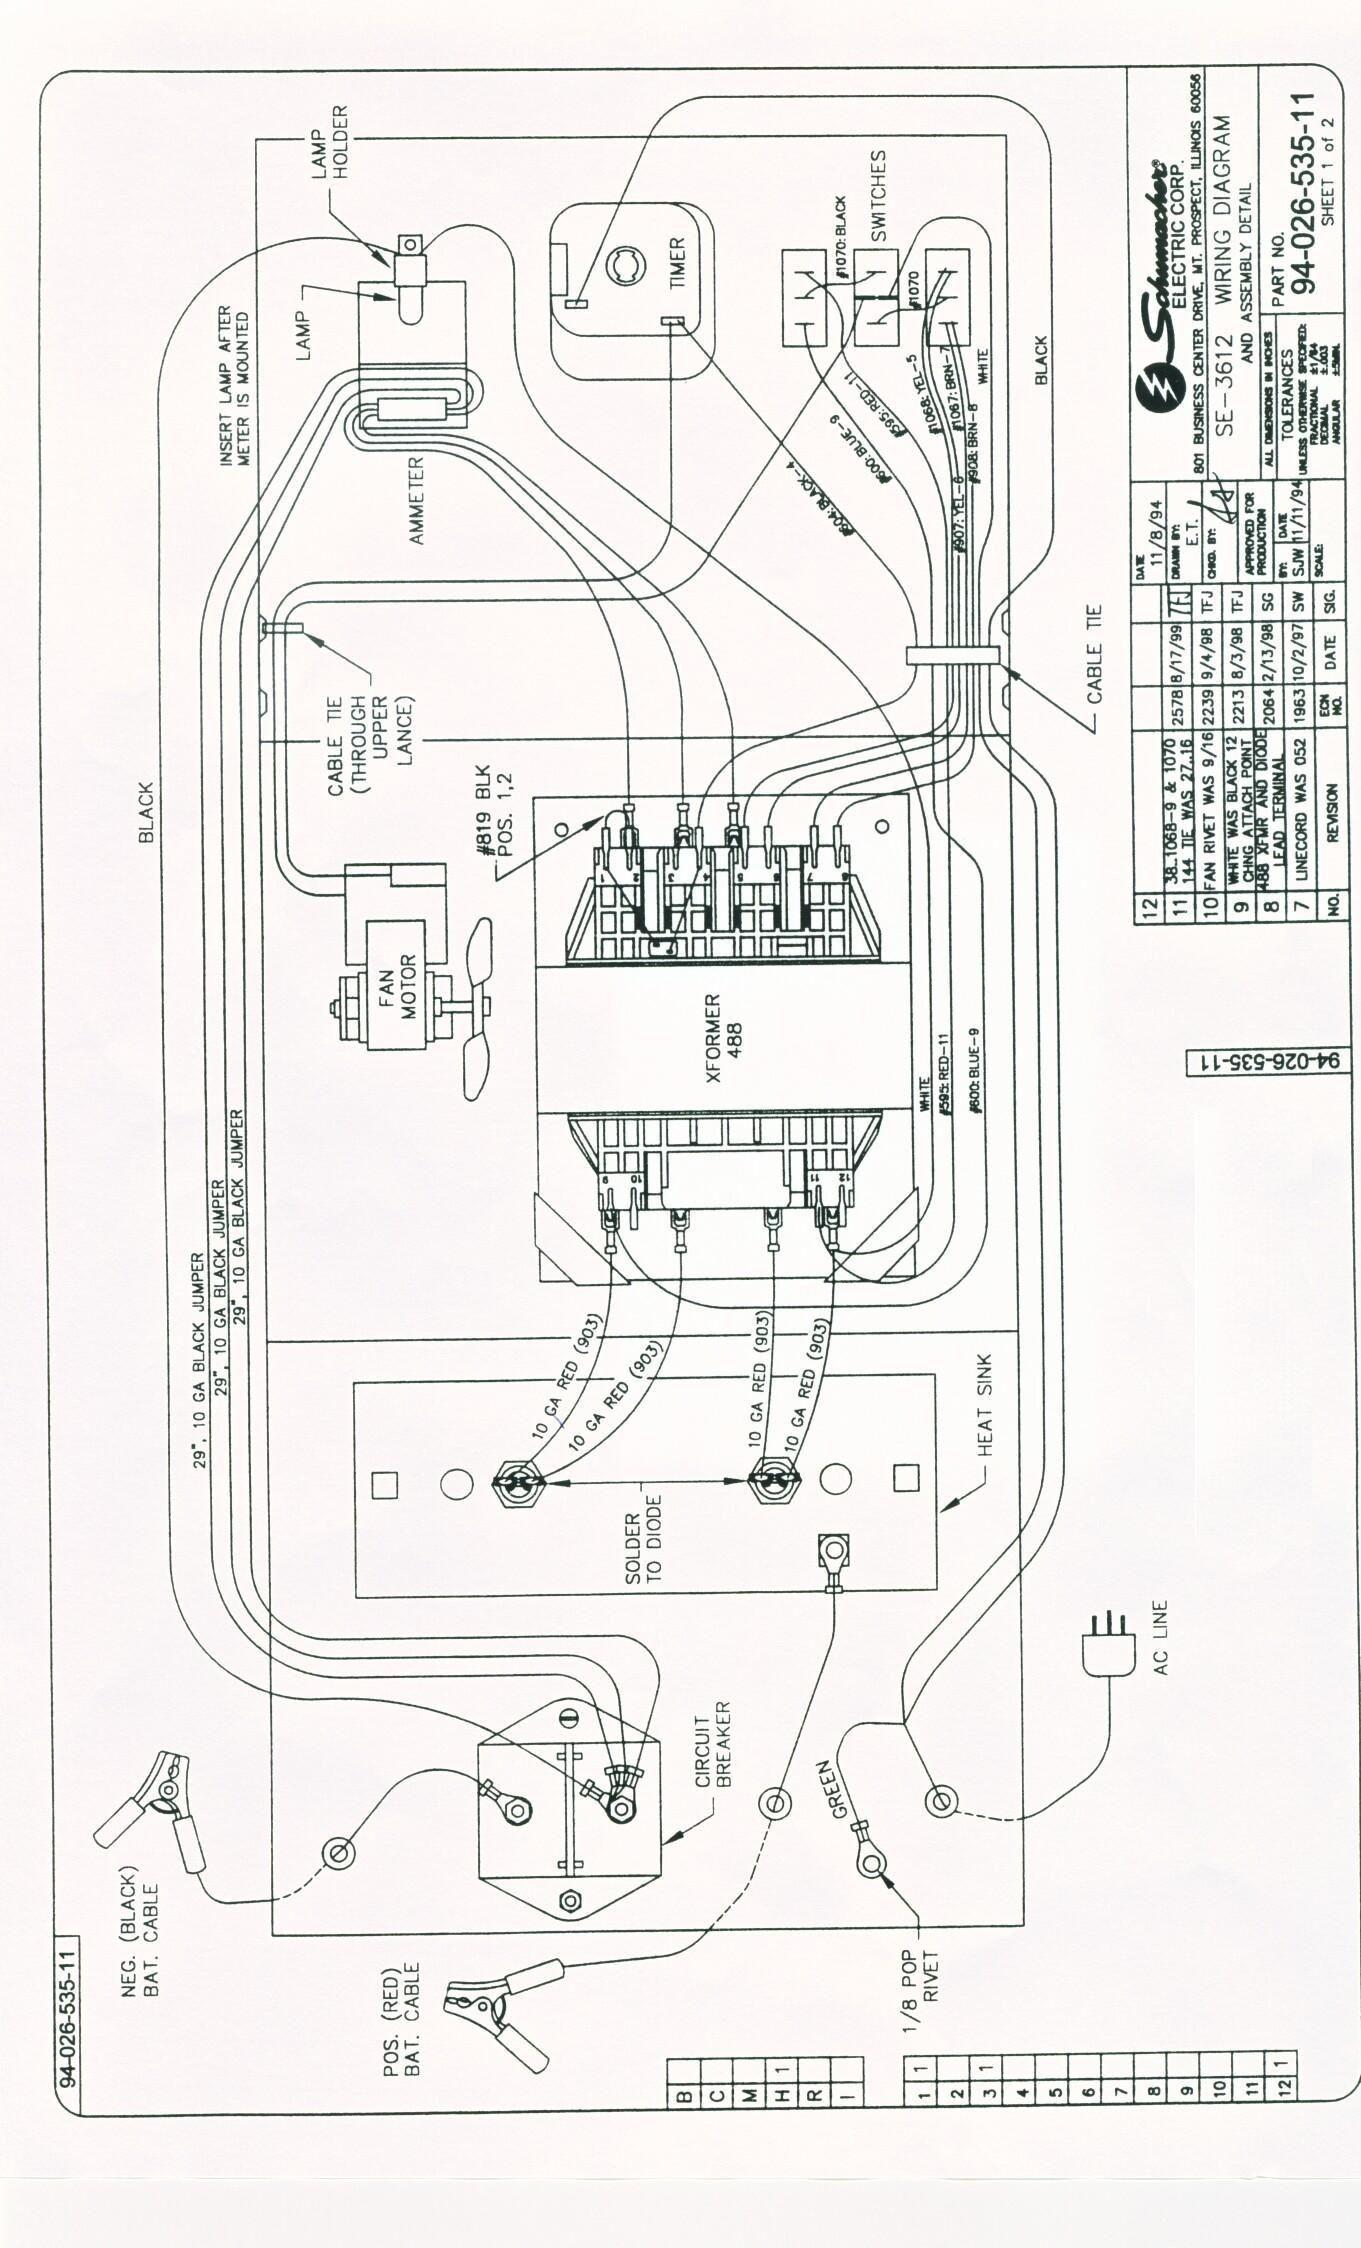 Elegant Schumacher Battery Charger Wiring Diagram In